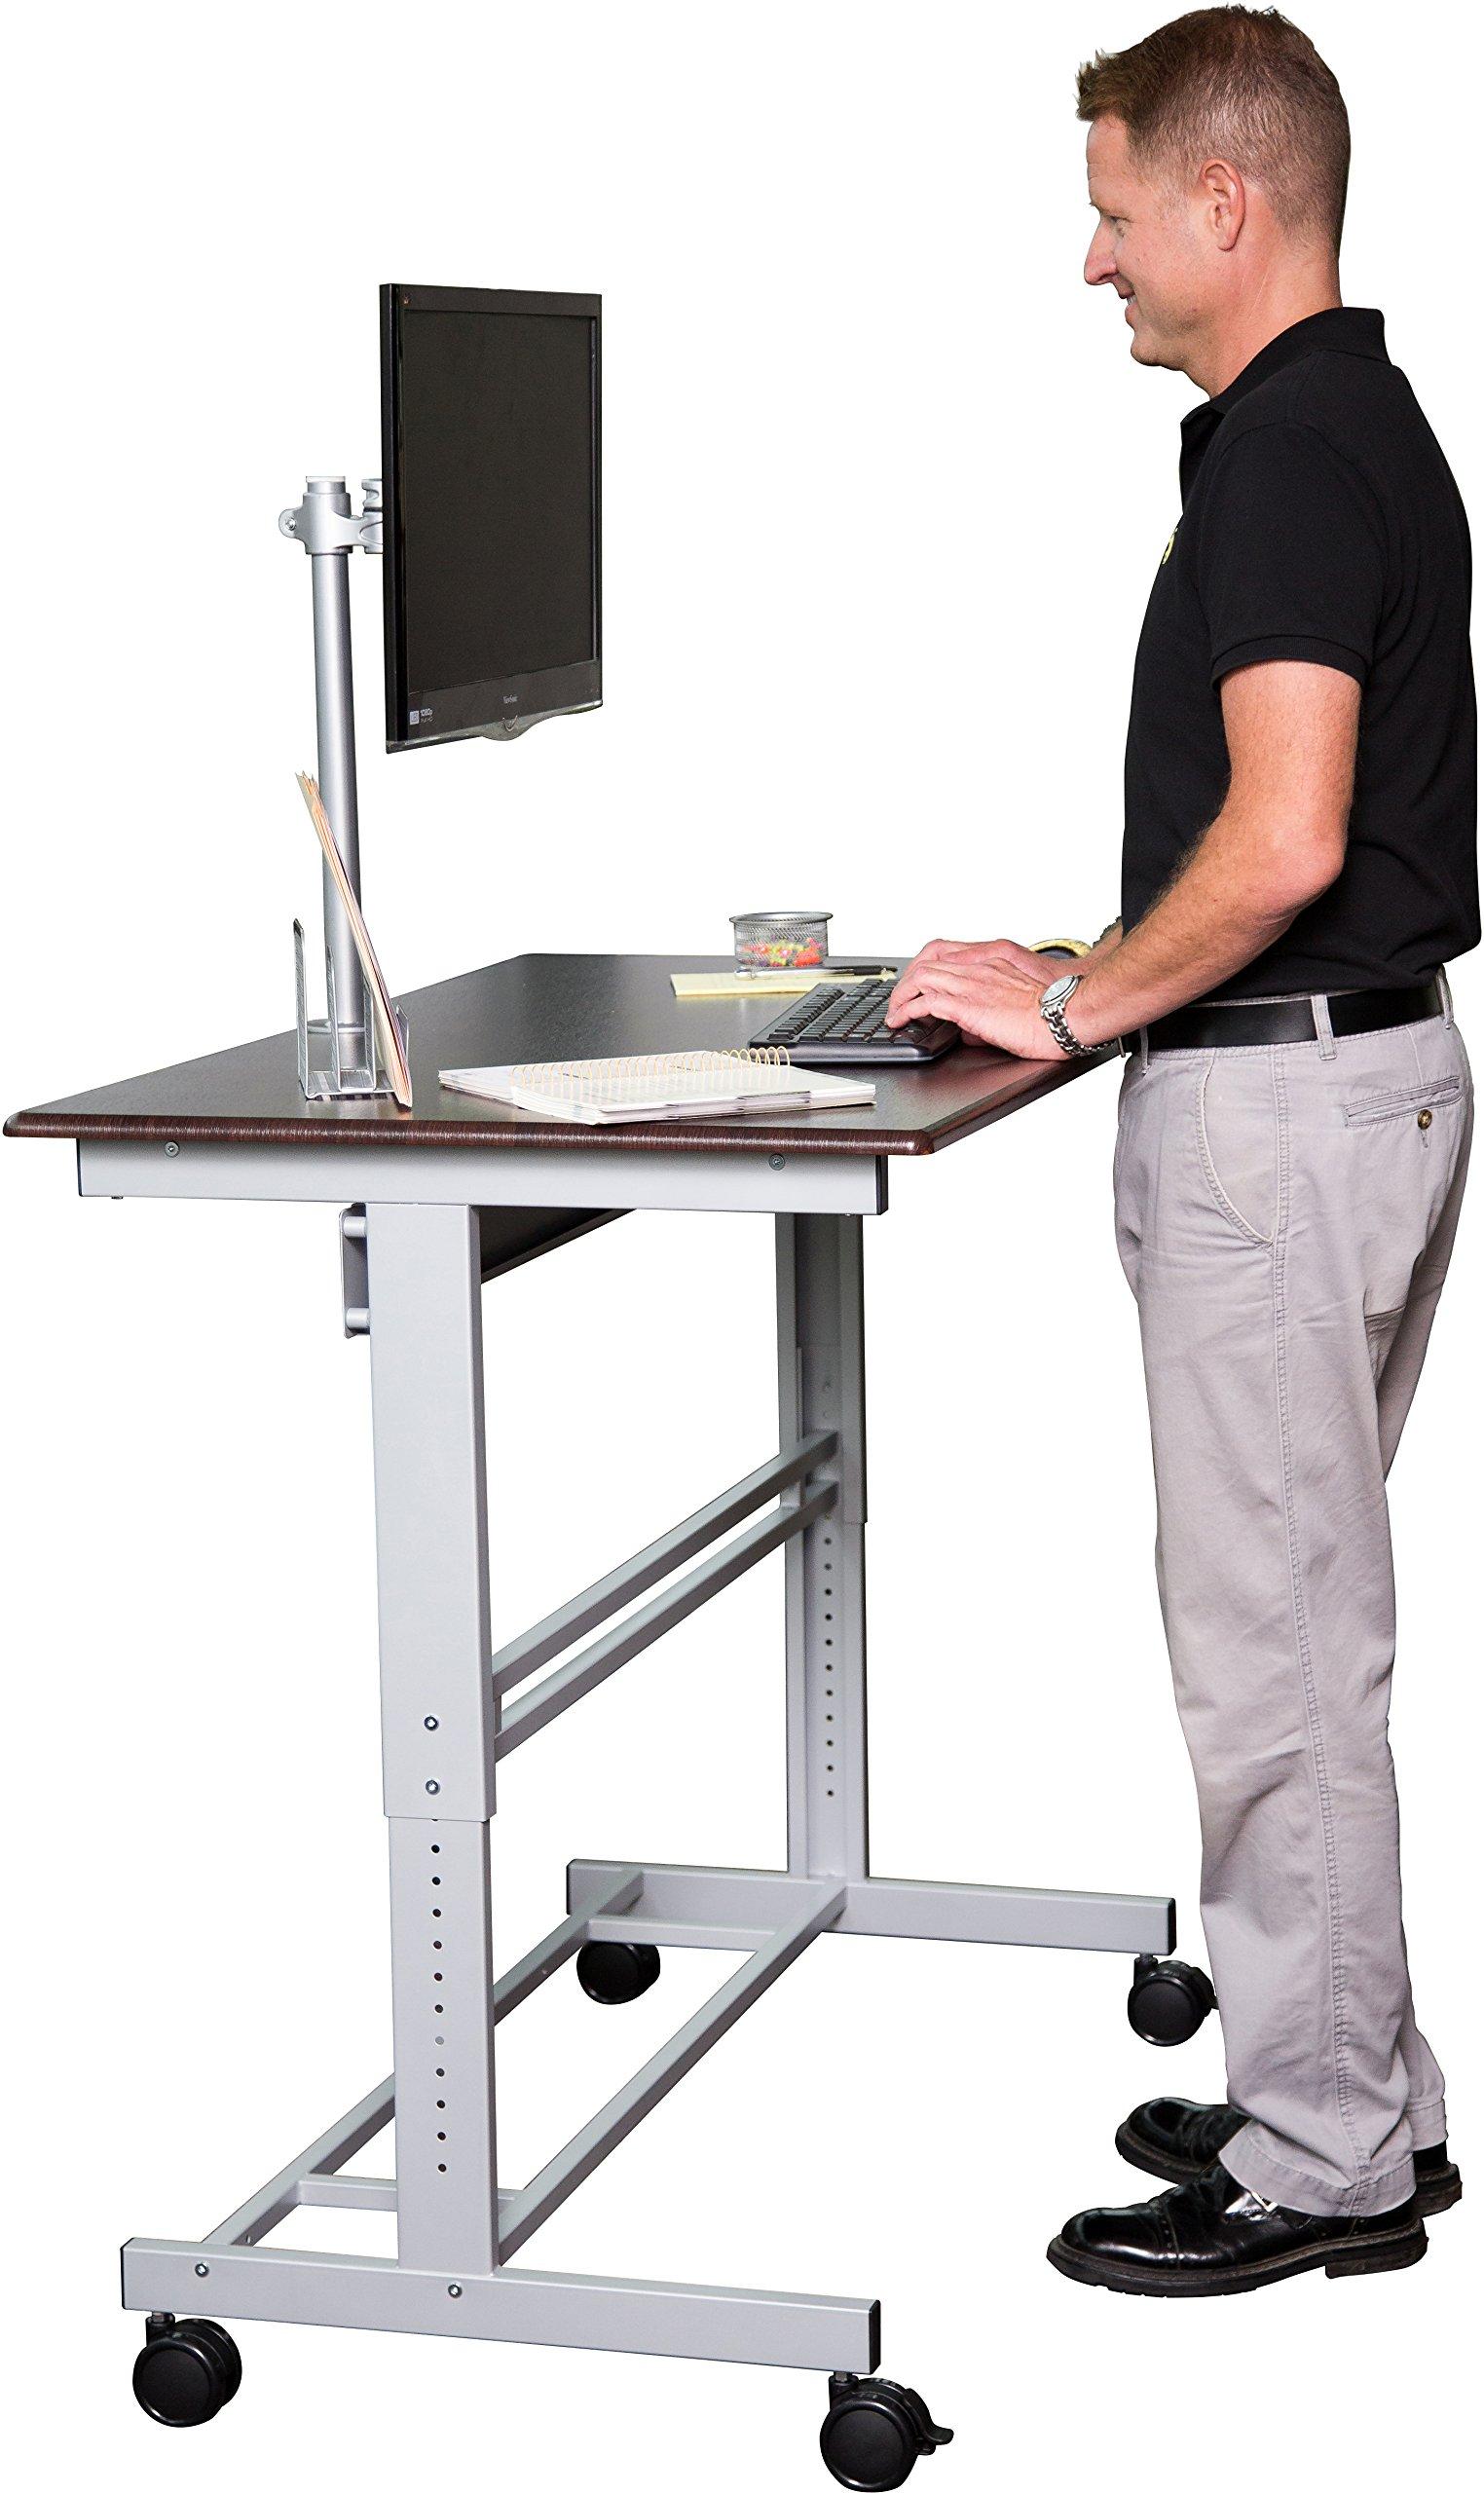 48'' Stand Up Desk w/ FREE Monitor Mount (Dark Walnut Shelves / Silver Frame)